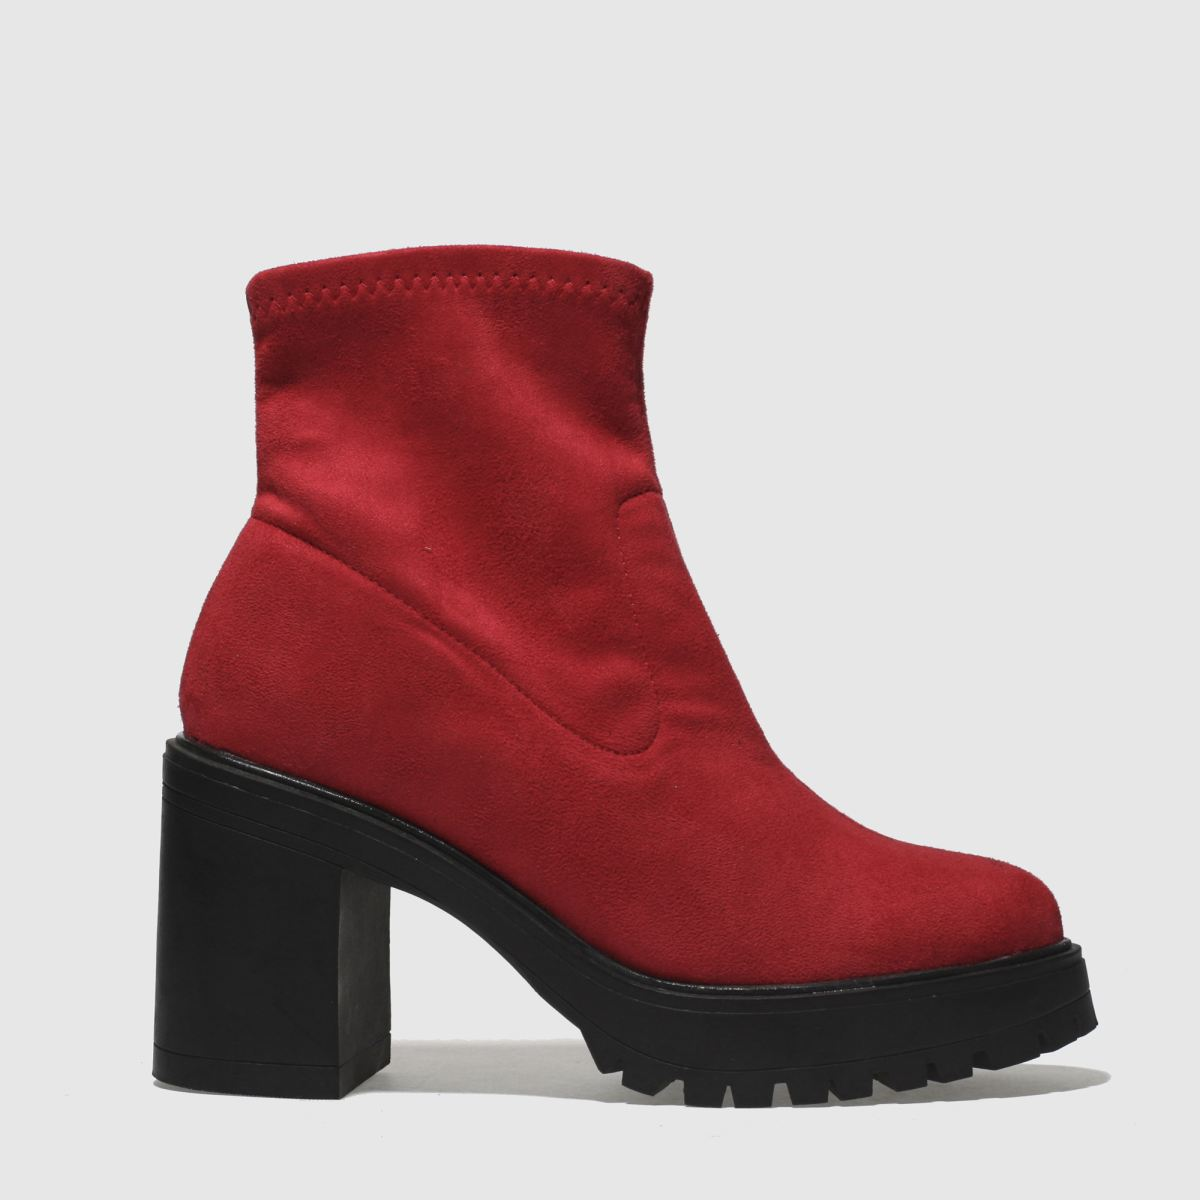 Schuh Red Splendid Boots